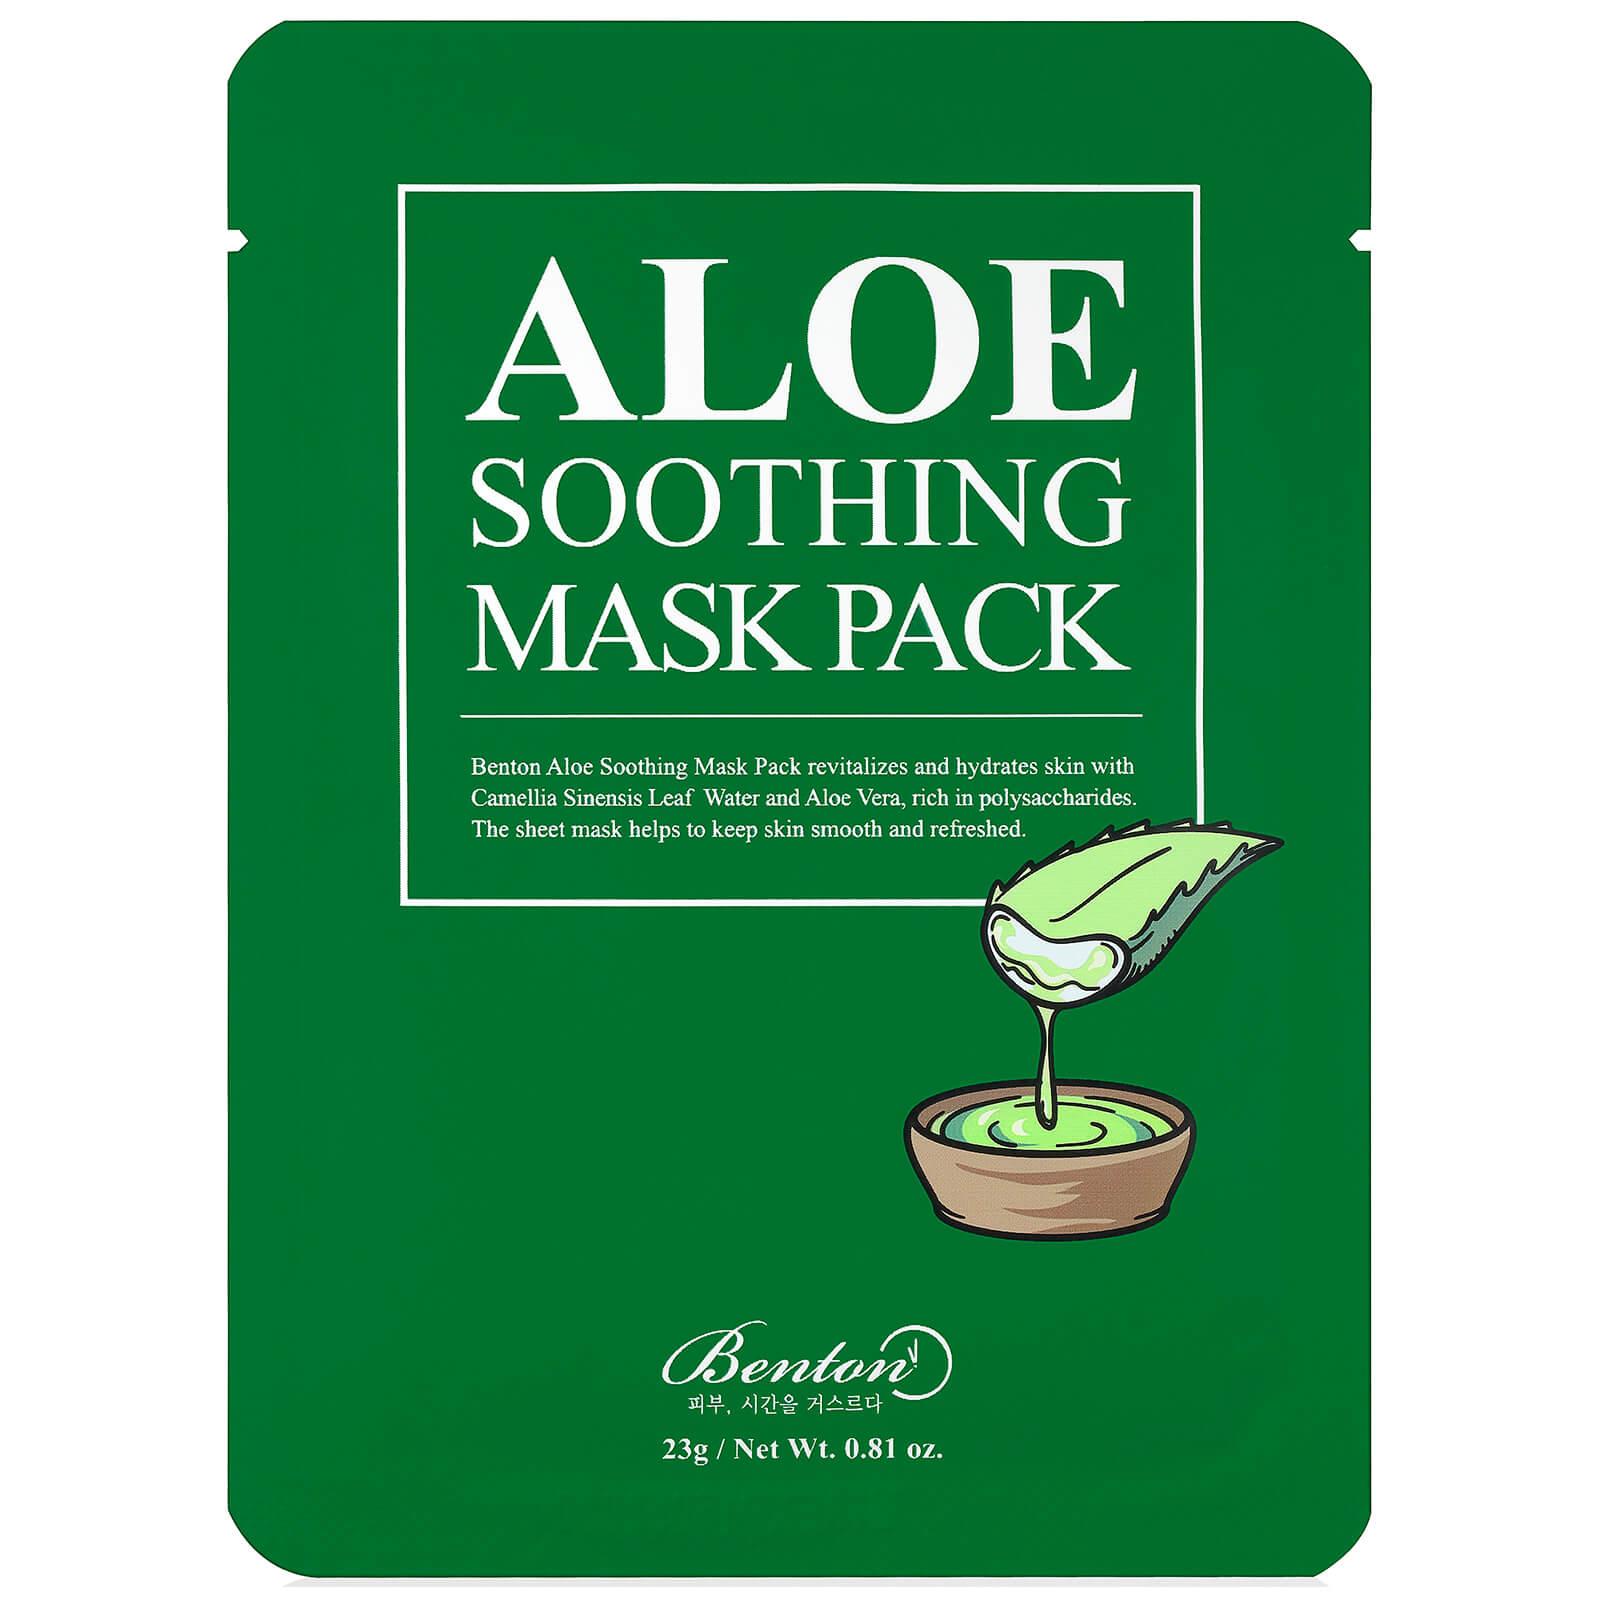 benton aloe mask